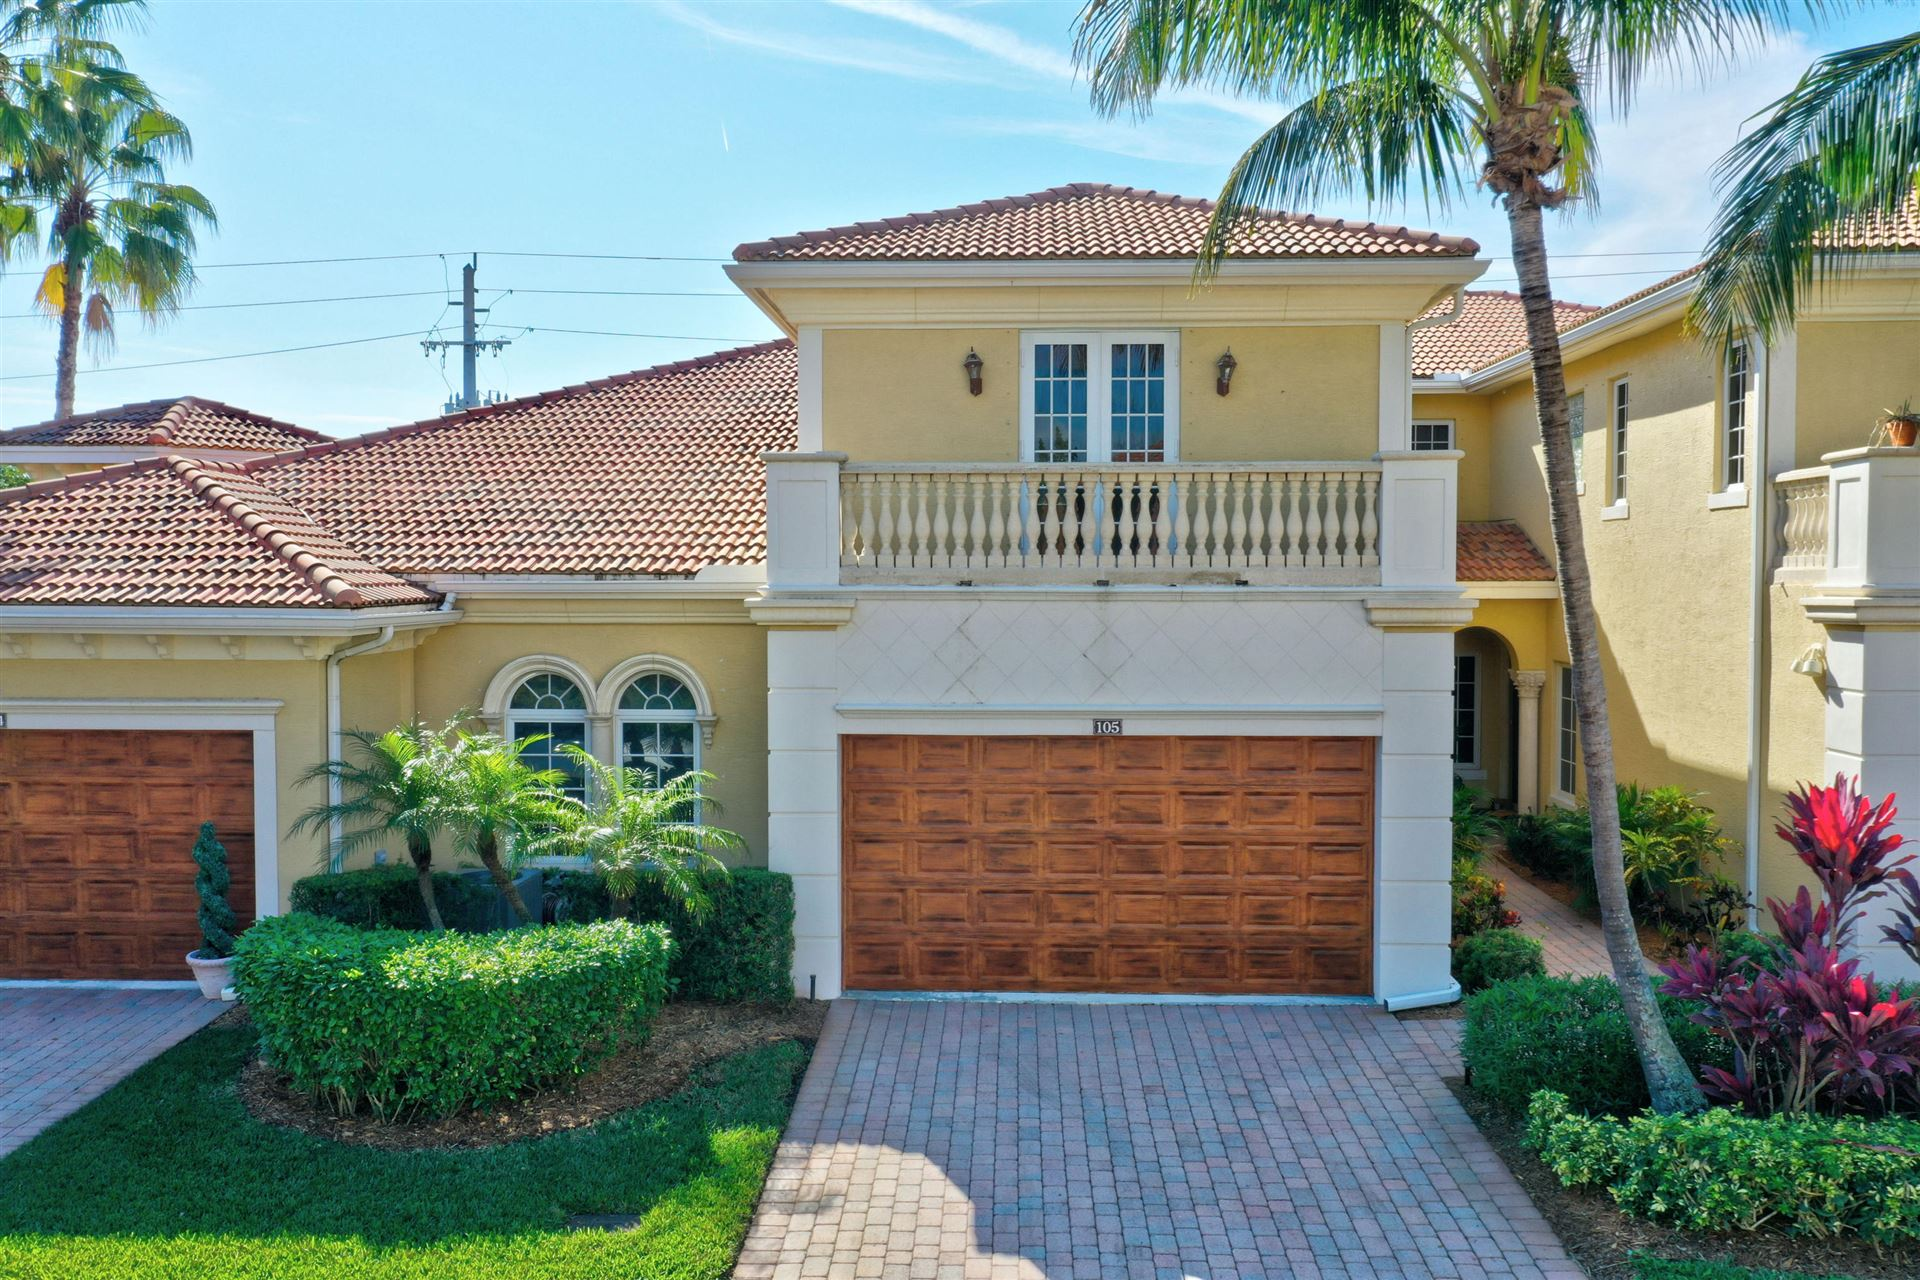 Photo of 105 Renaissance Drive, North Palm Beach, FL 33410 (MLS # RX-10685779)